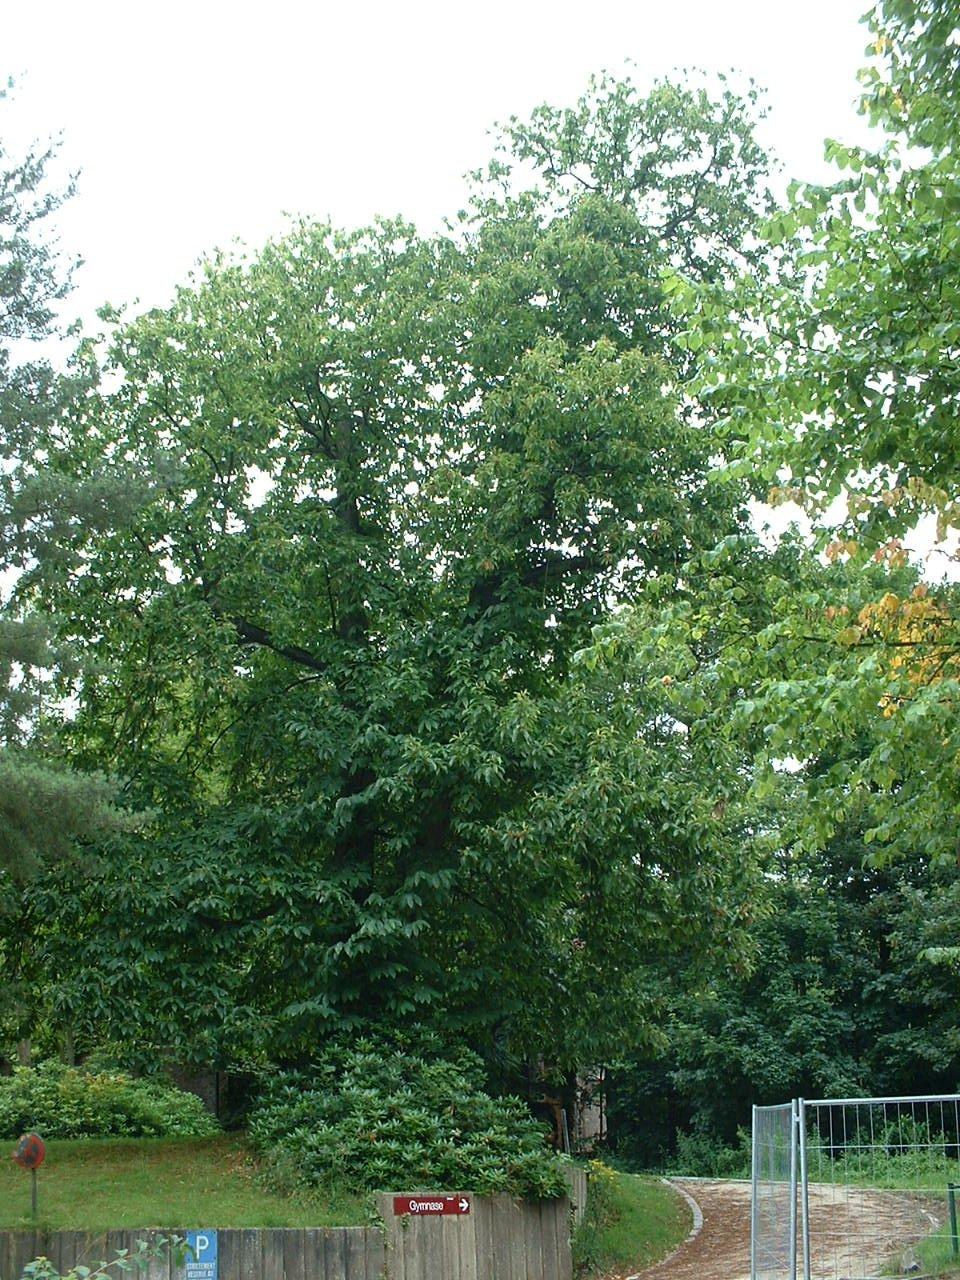 Tamme kastanje – Watermaal-Bosvoorde, Park van het Sint-Hubert collège, Charle-Albertlaan, 9 –  23 Juli 2002